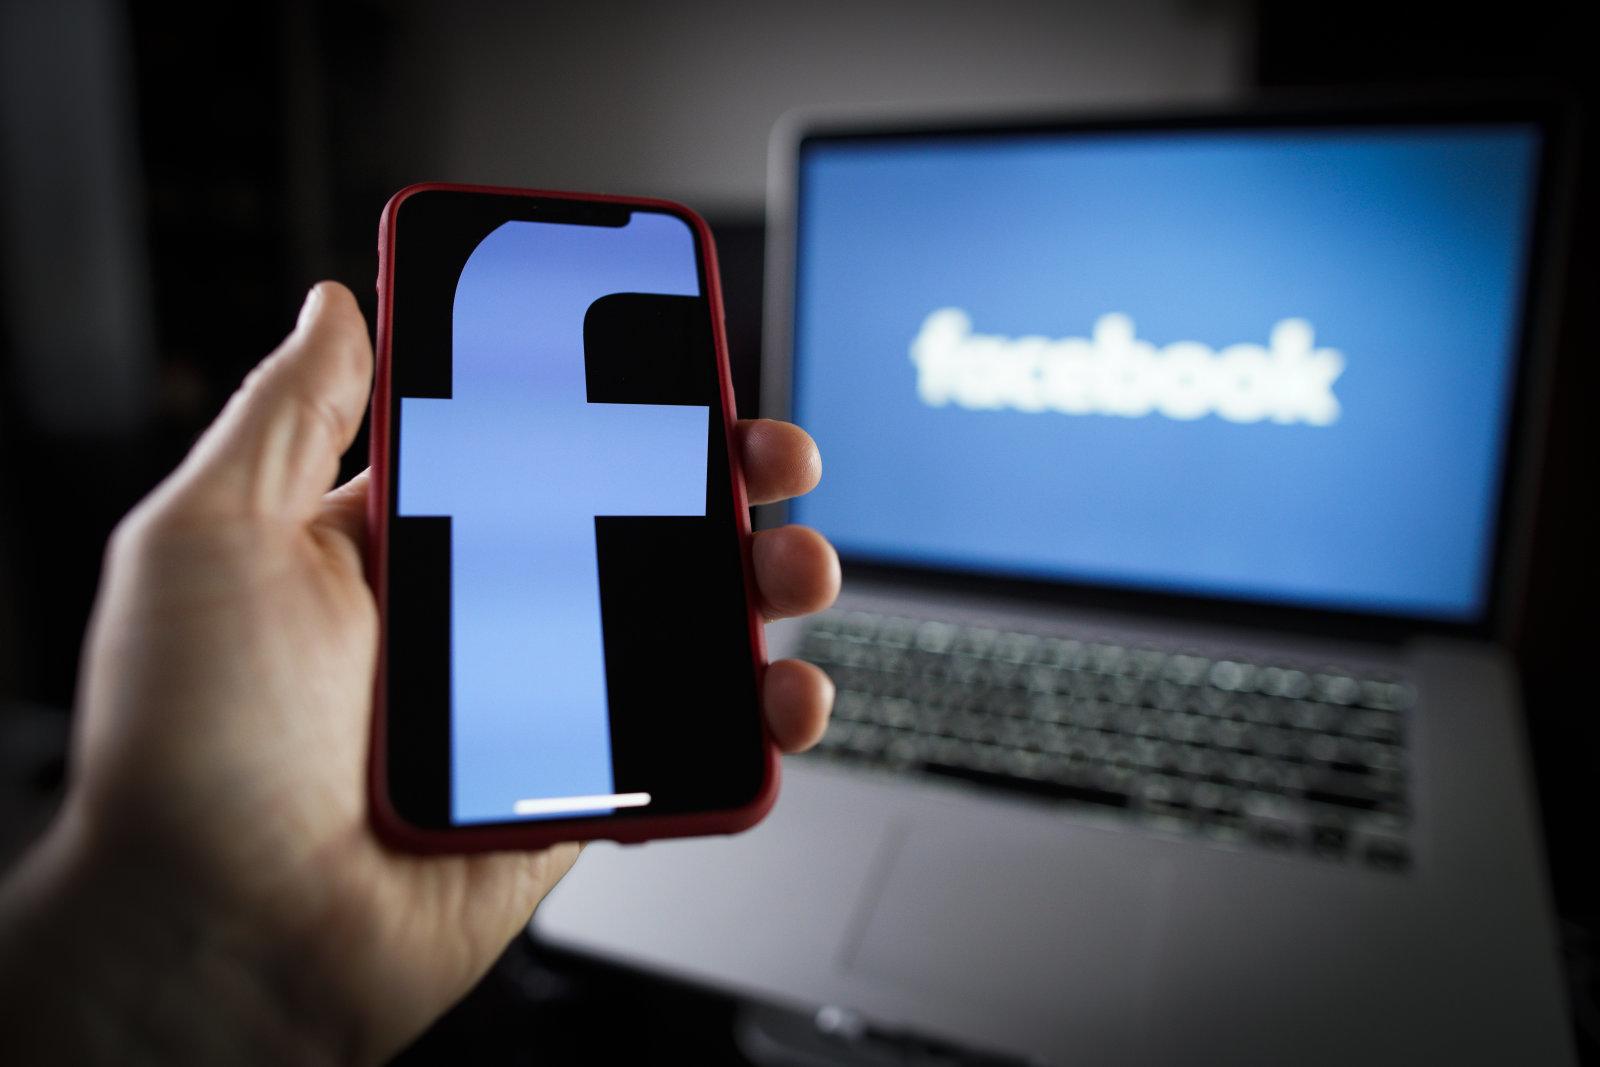 Celá řada iOS aplikací tajně sdílela data s Facebookem